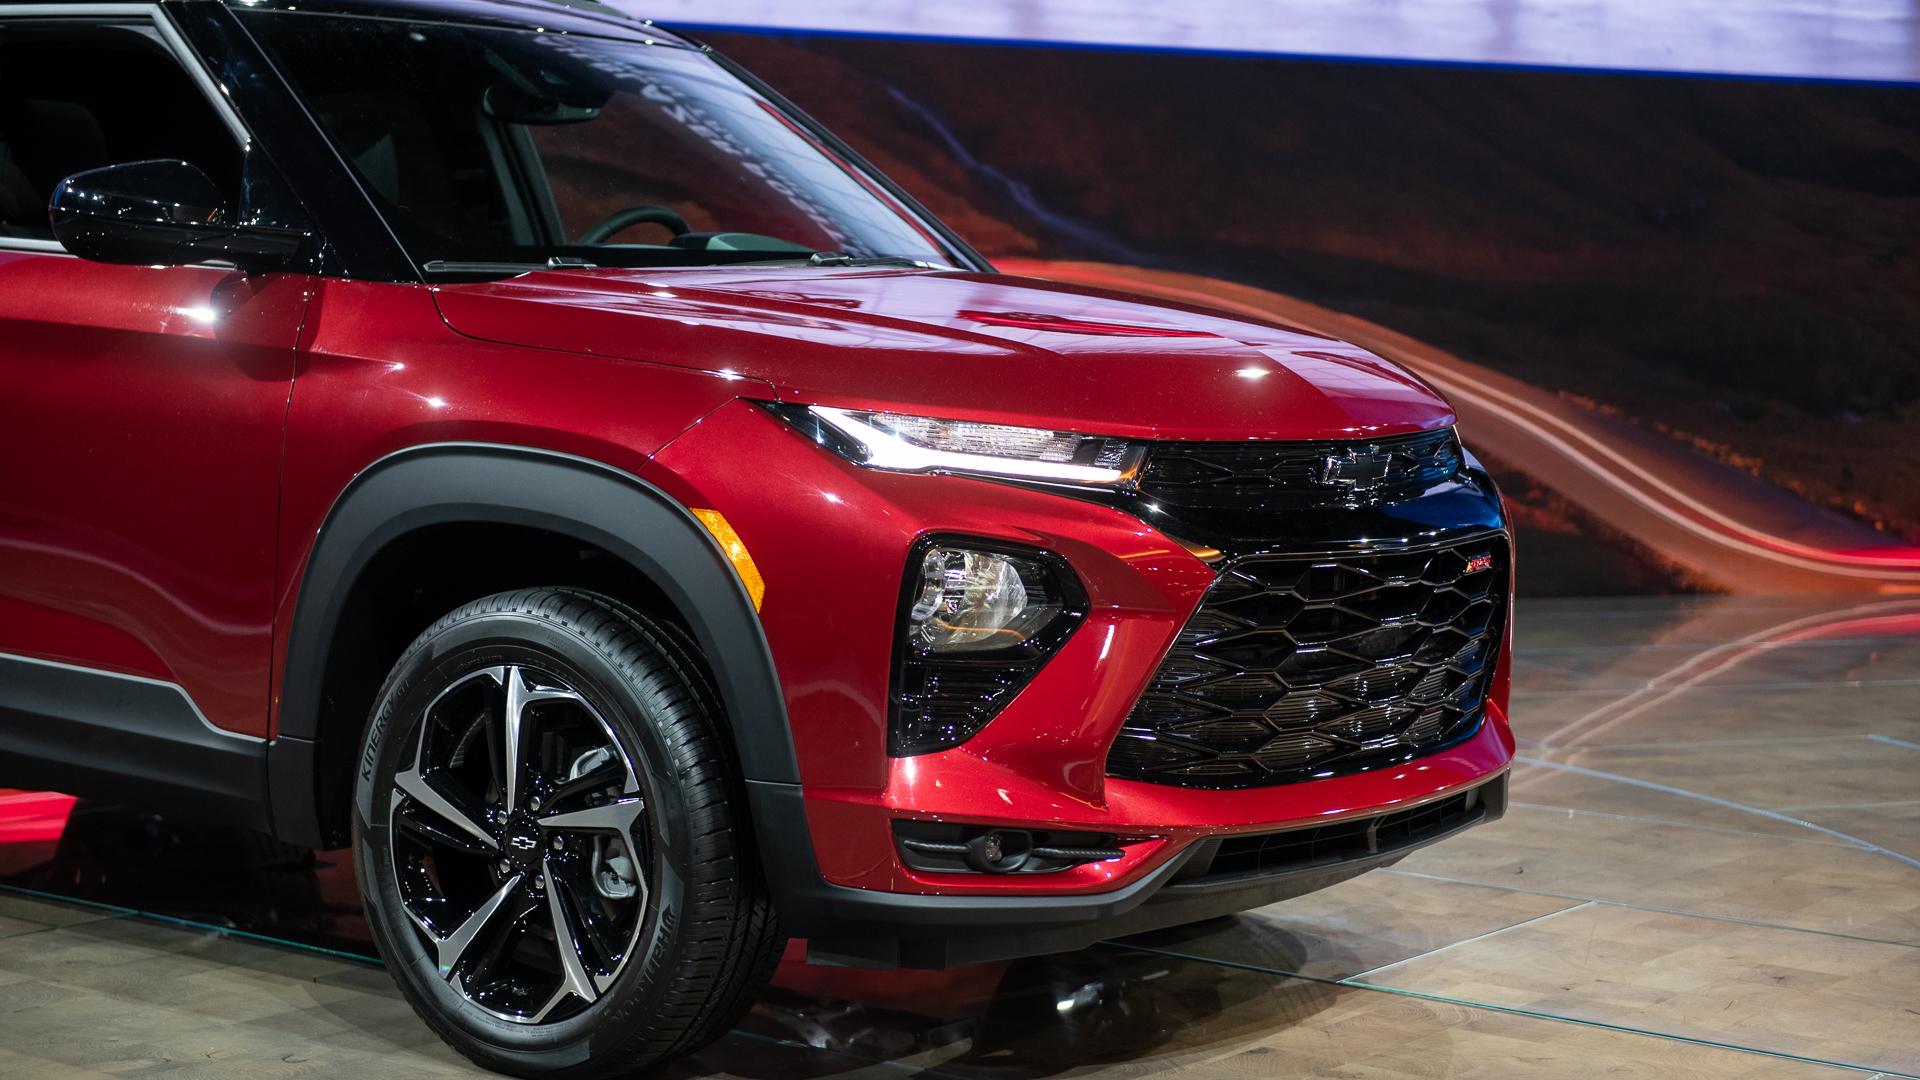 2021 Chevrolet Trailblazer, 2019 LA Auto Show